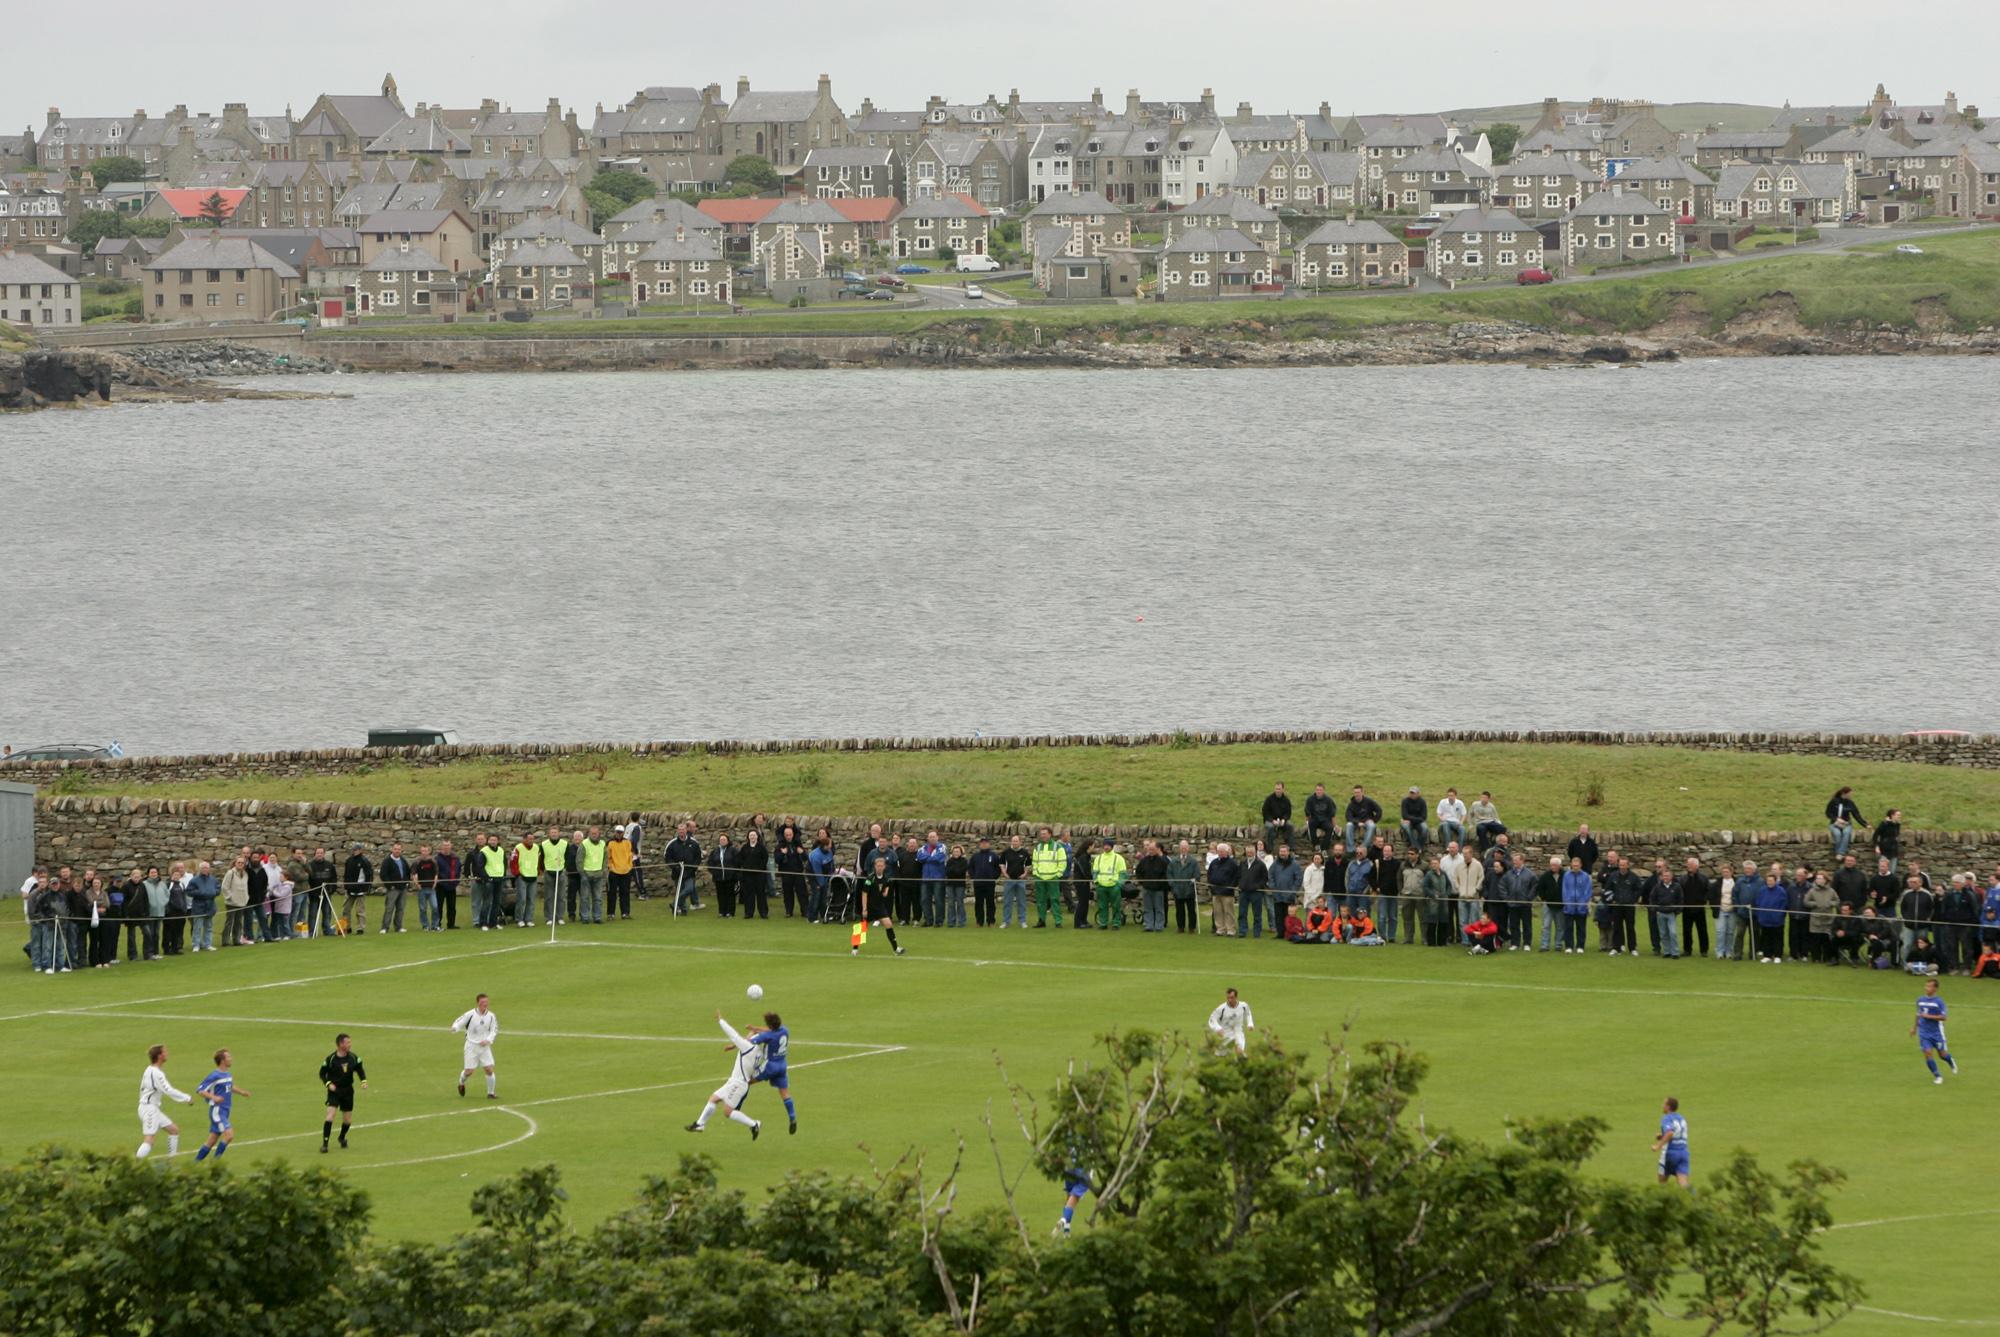 Iles Shetland vs Ile Saaremaa (Lerwick, Iles Shetland, ECOSSE, 2005) Copyright ALAIN GADOFFRE